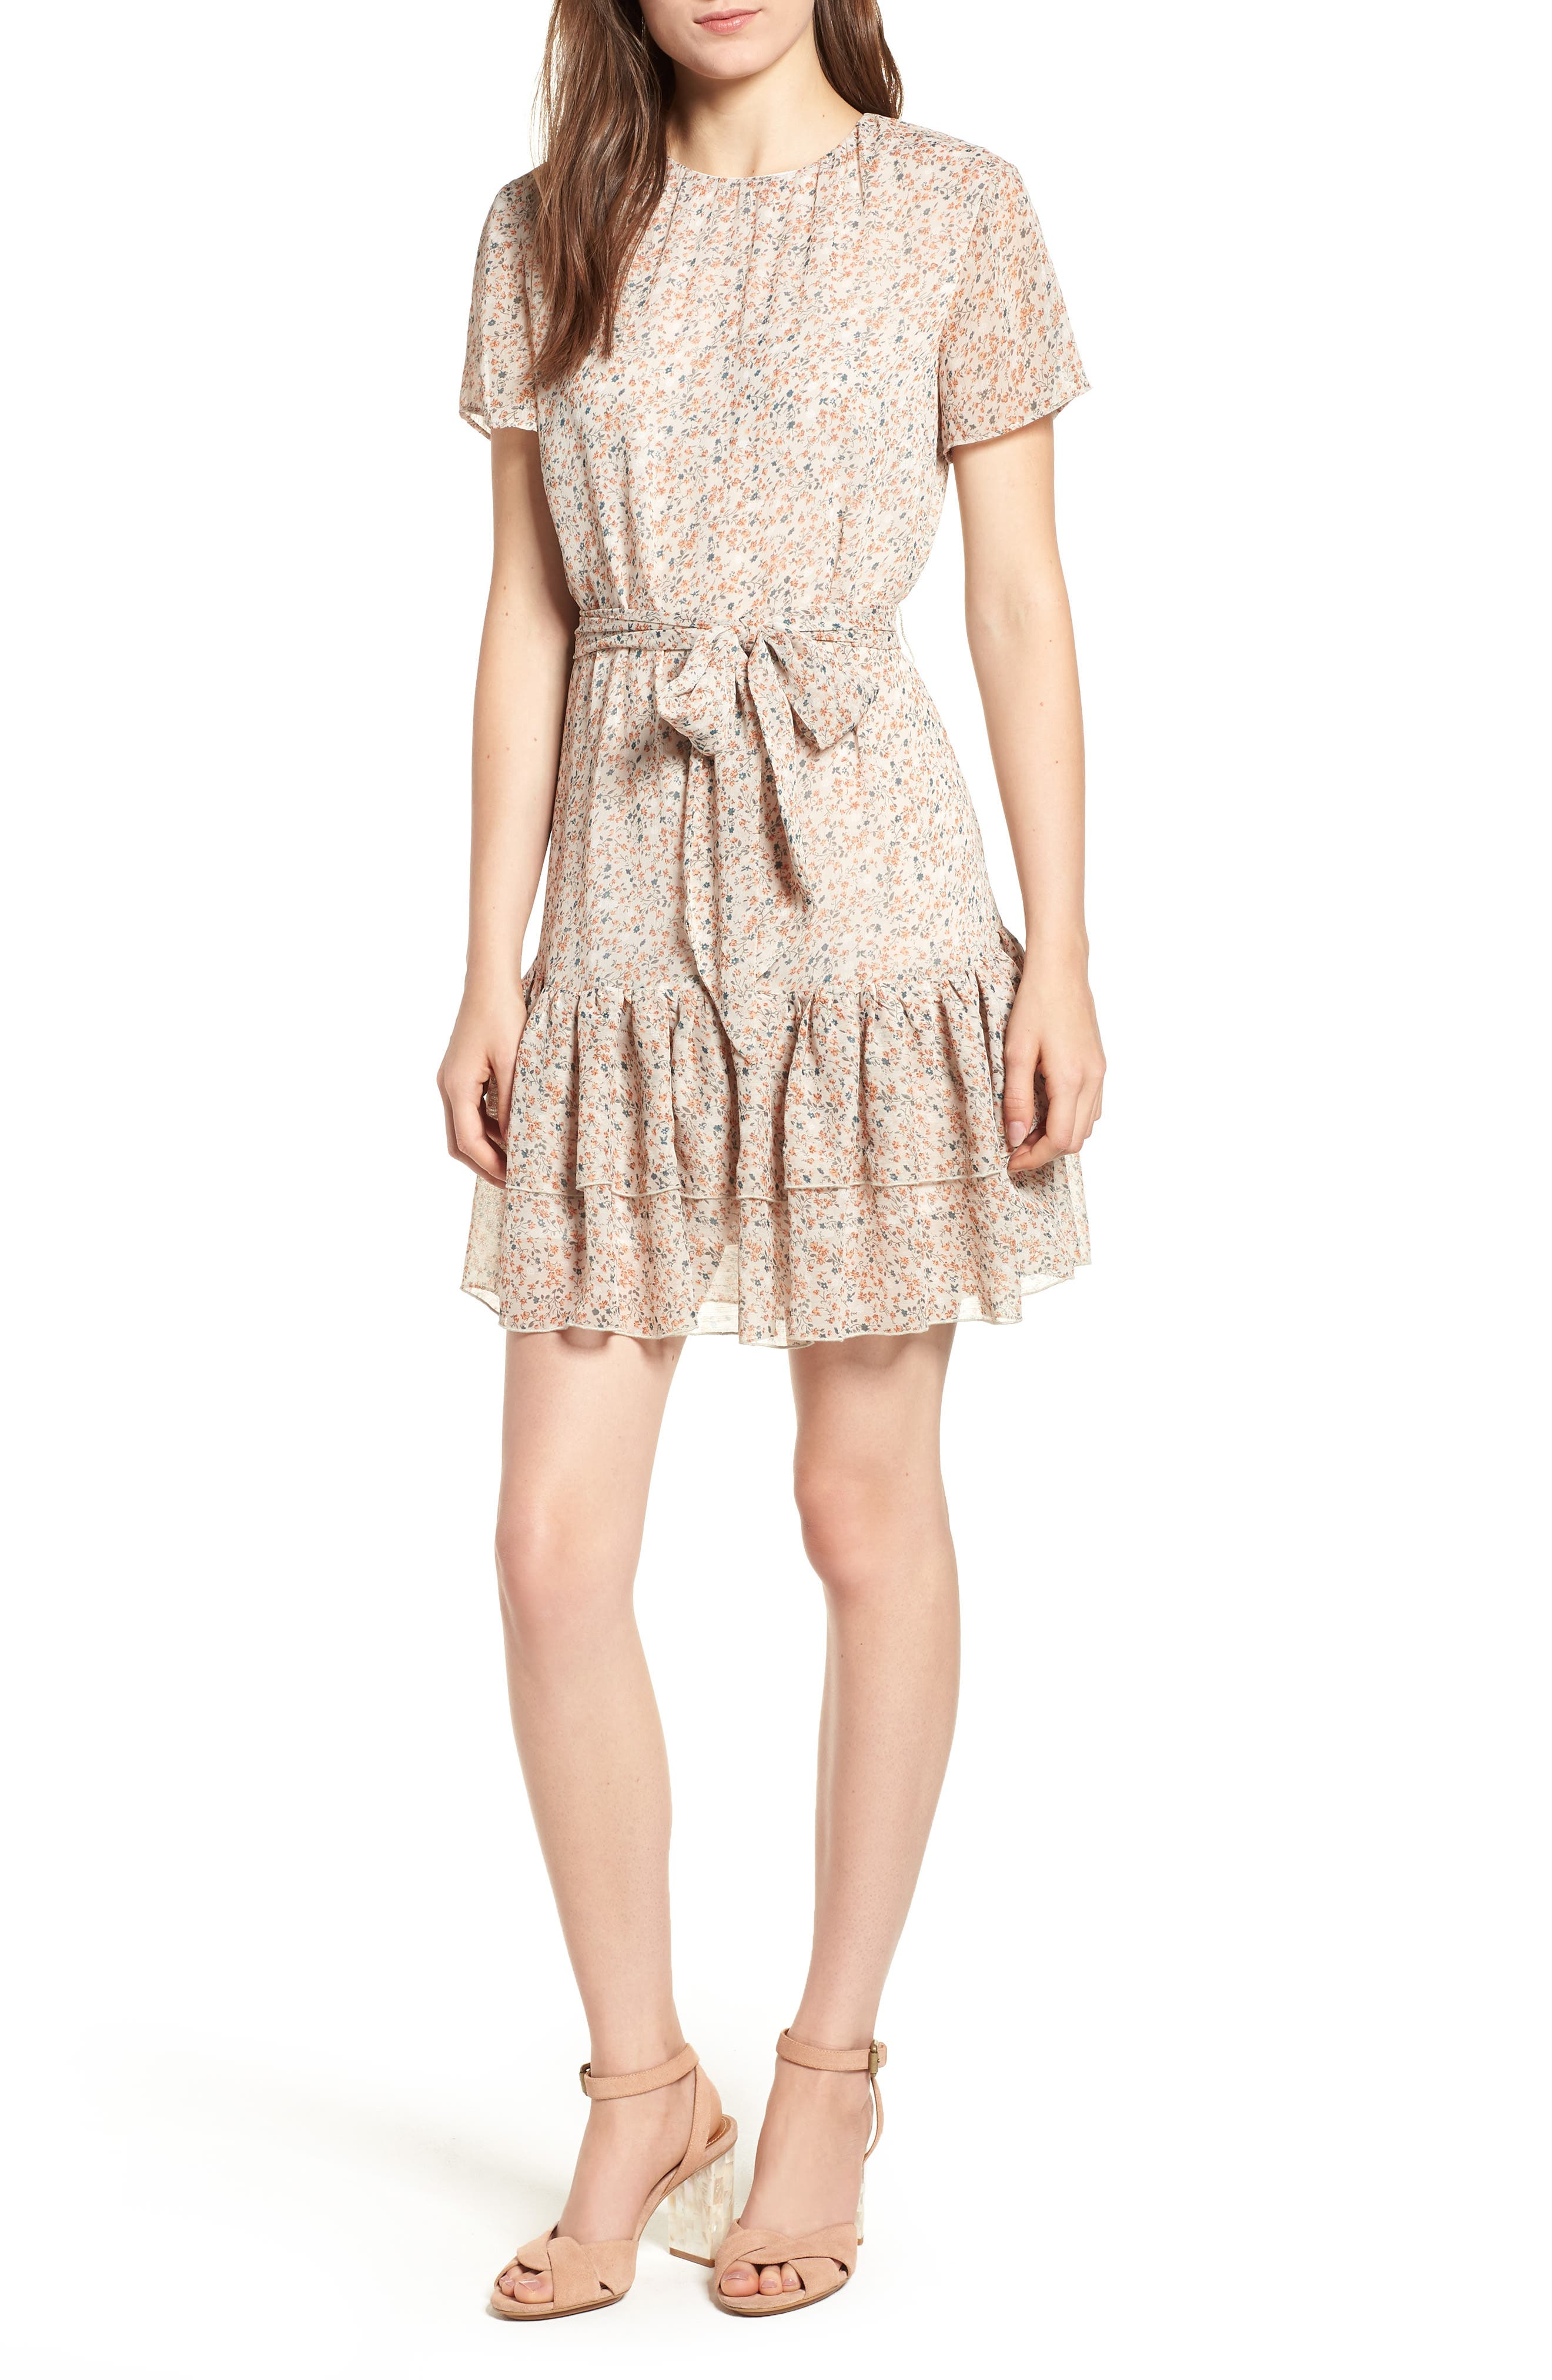 Cosette Minidress,                         Main,                         color, PEACH DAHLIA FLORAL